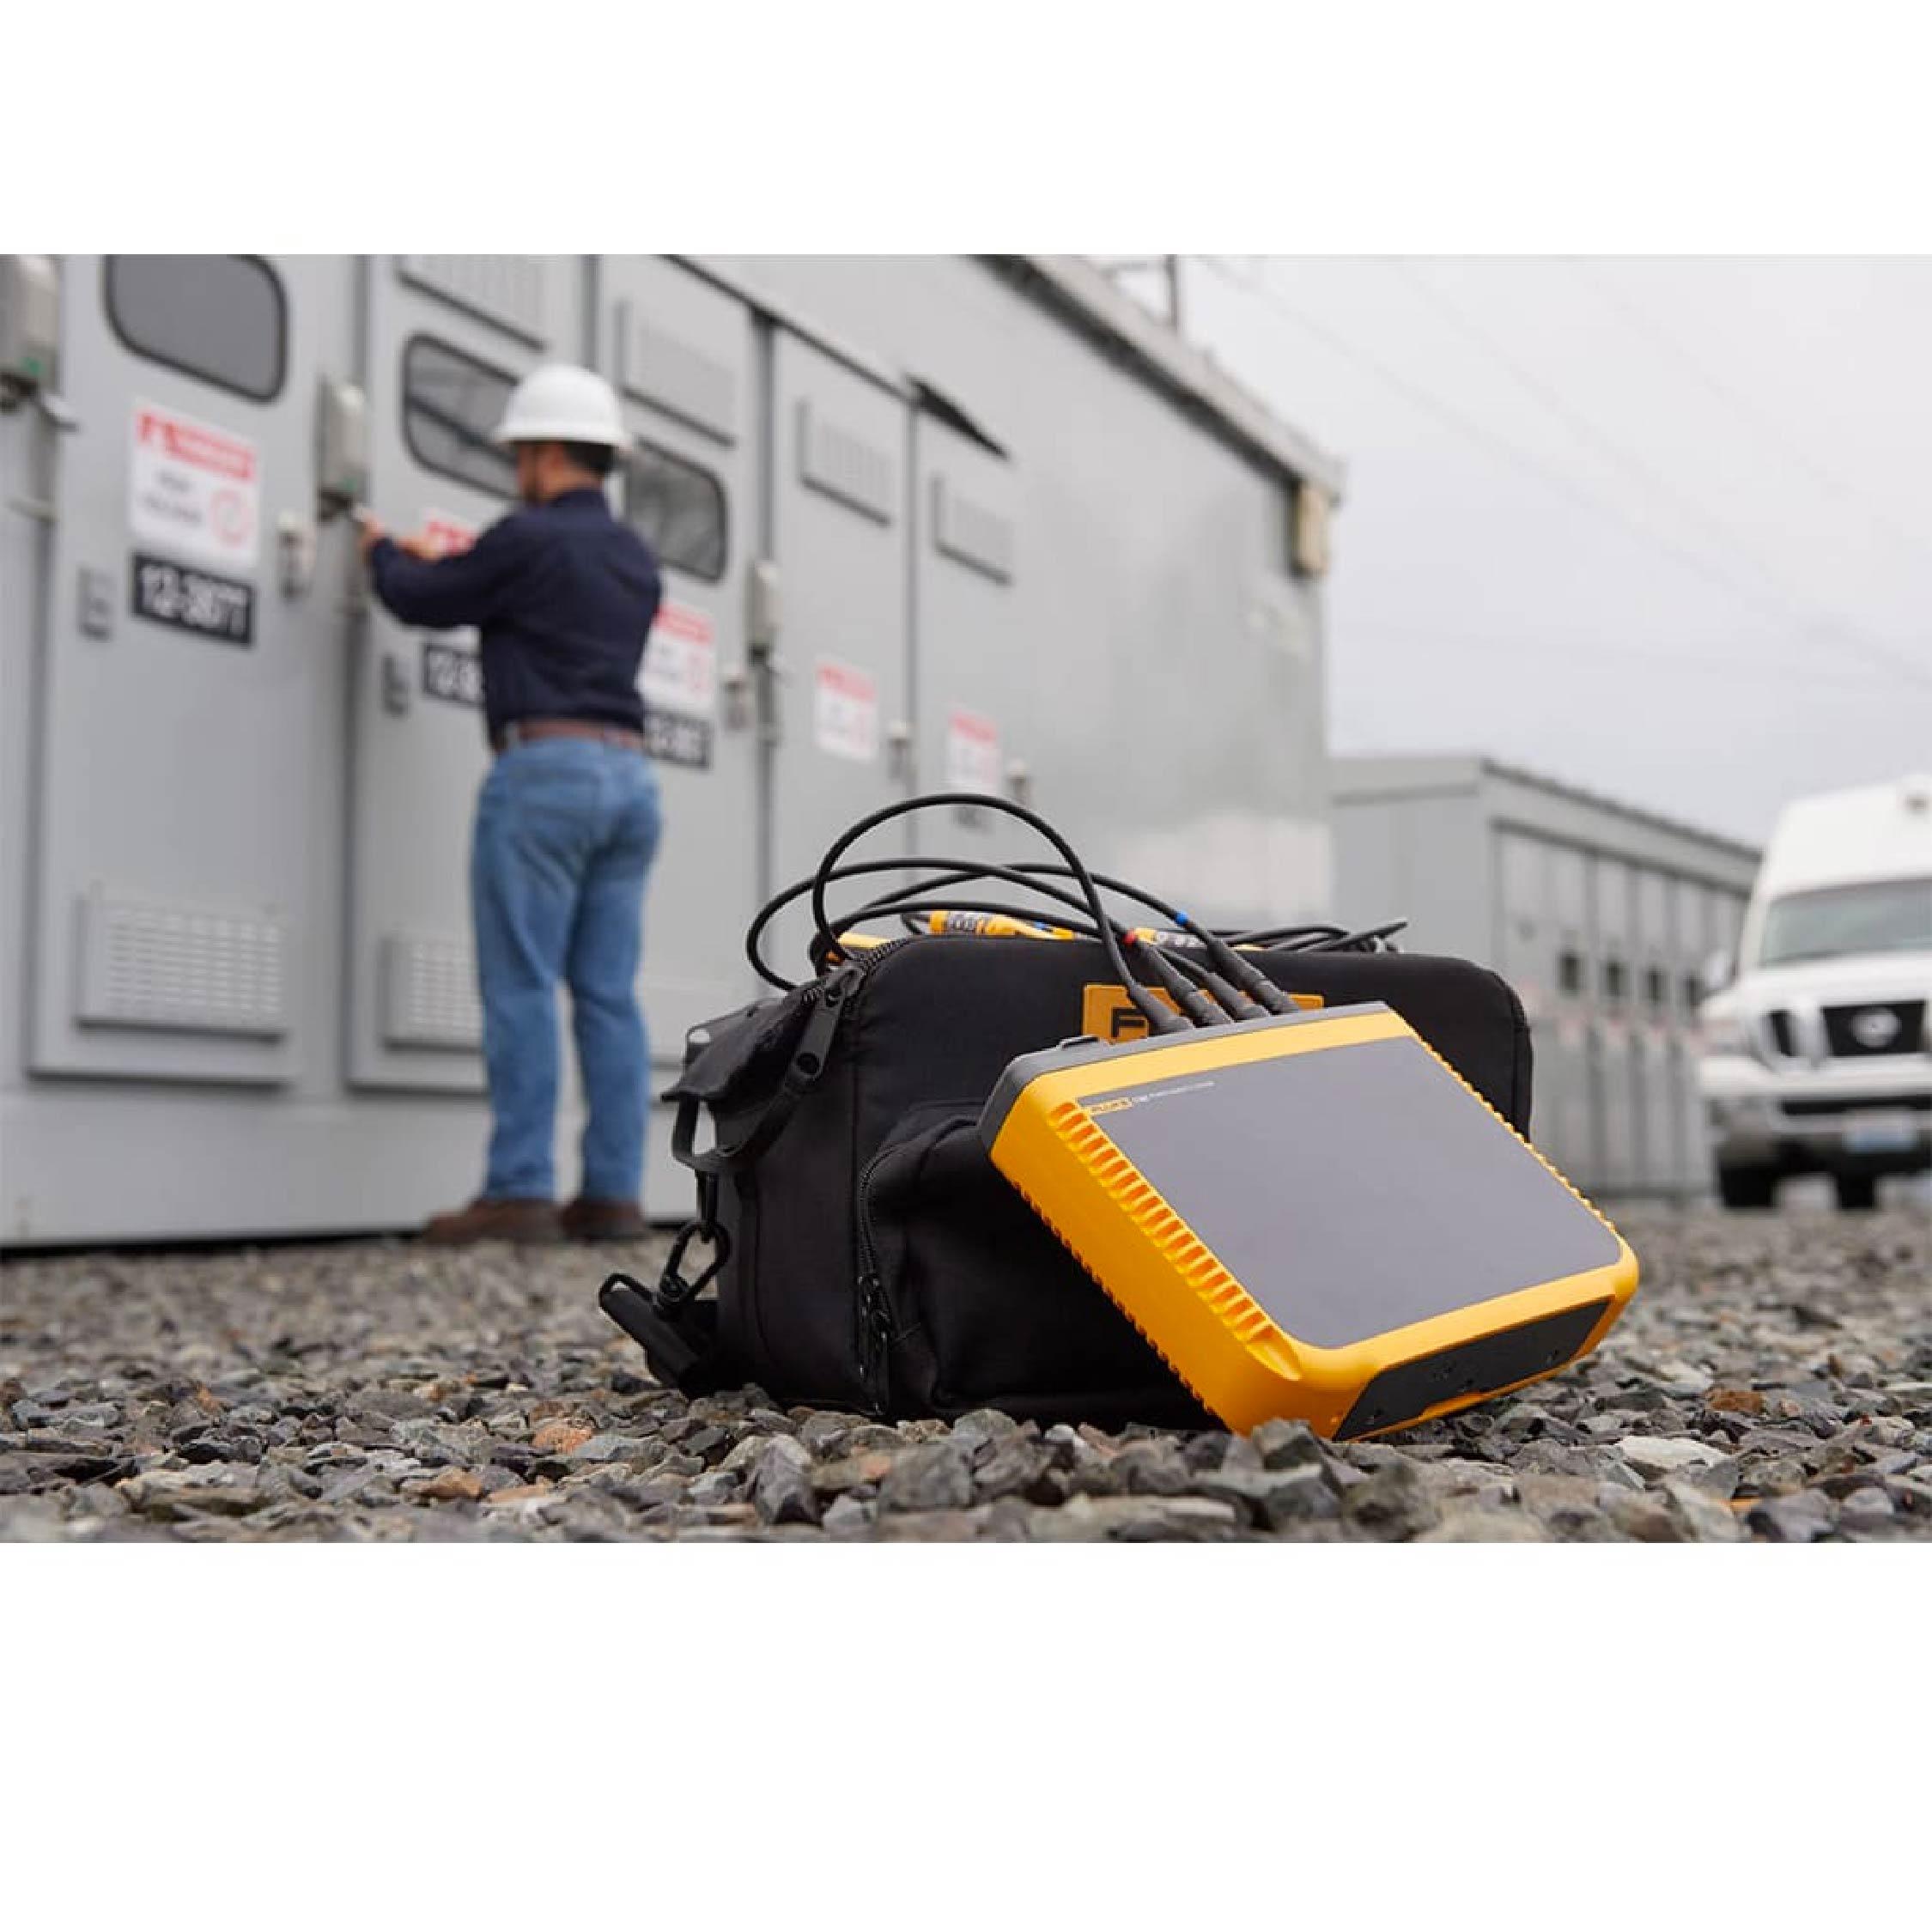 FLUKE 1746-15-INTL - Power Quality Logger w/60 cm 1,500A iFlex, INTL